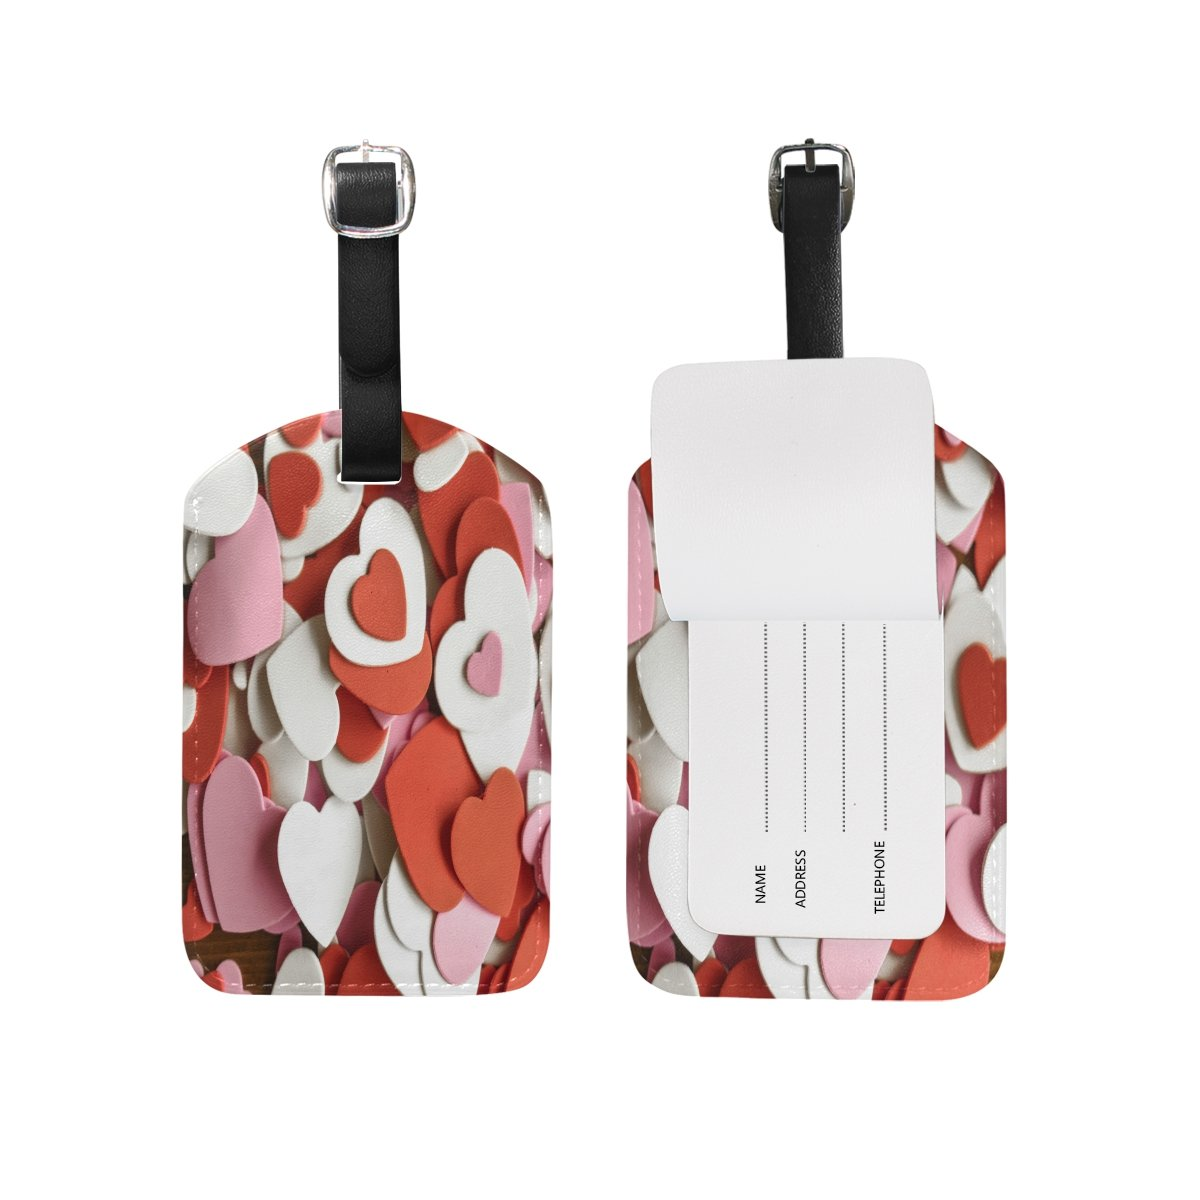 1Pcs Saobao Travel Luggage Tag Multiple Love Splice PU Leather Baggage Suitcase Travel ID Bag Tag